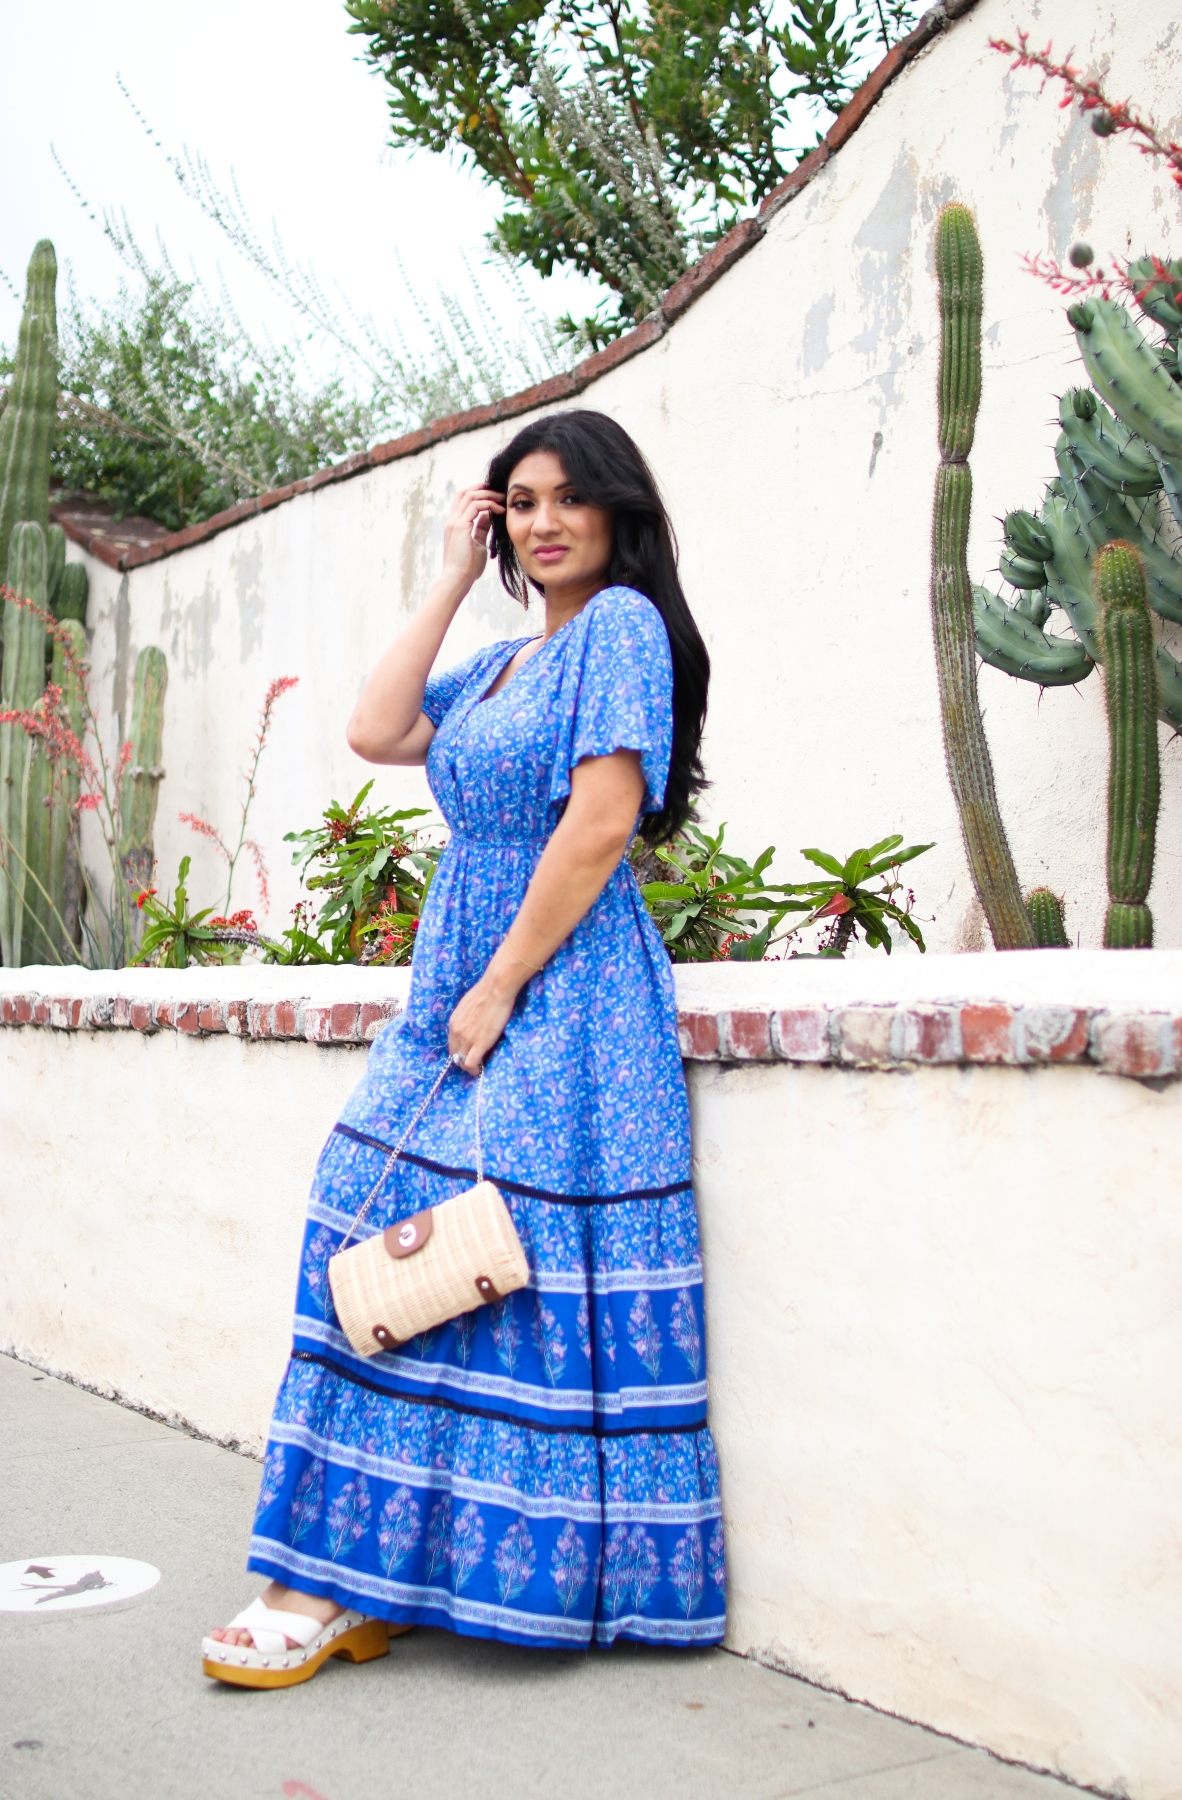 Shein Blue Floral Maxi Dress